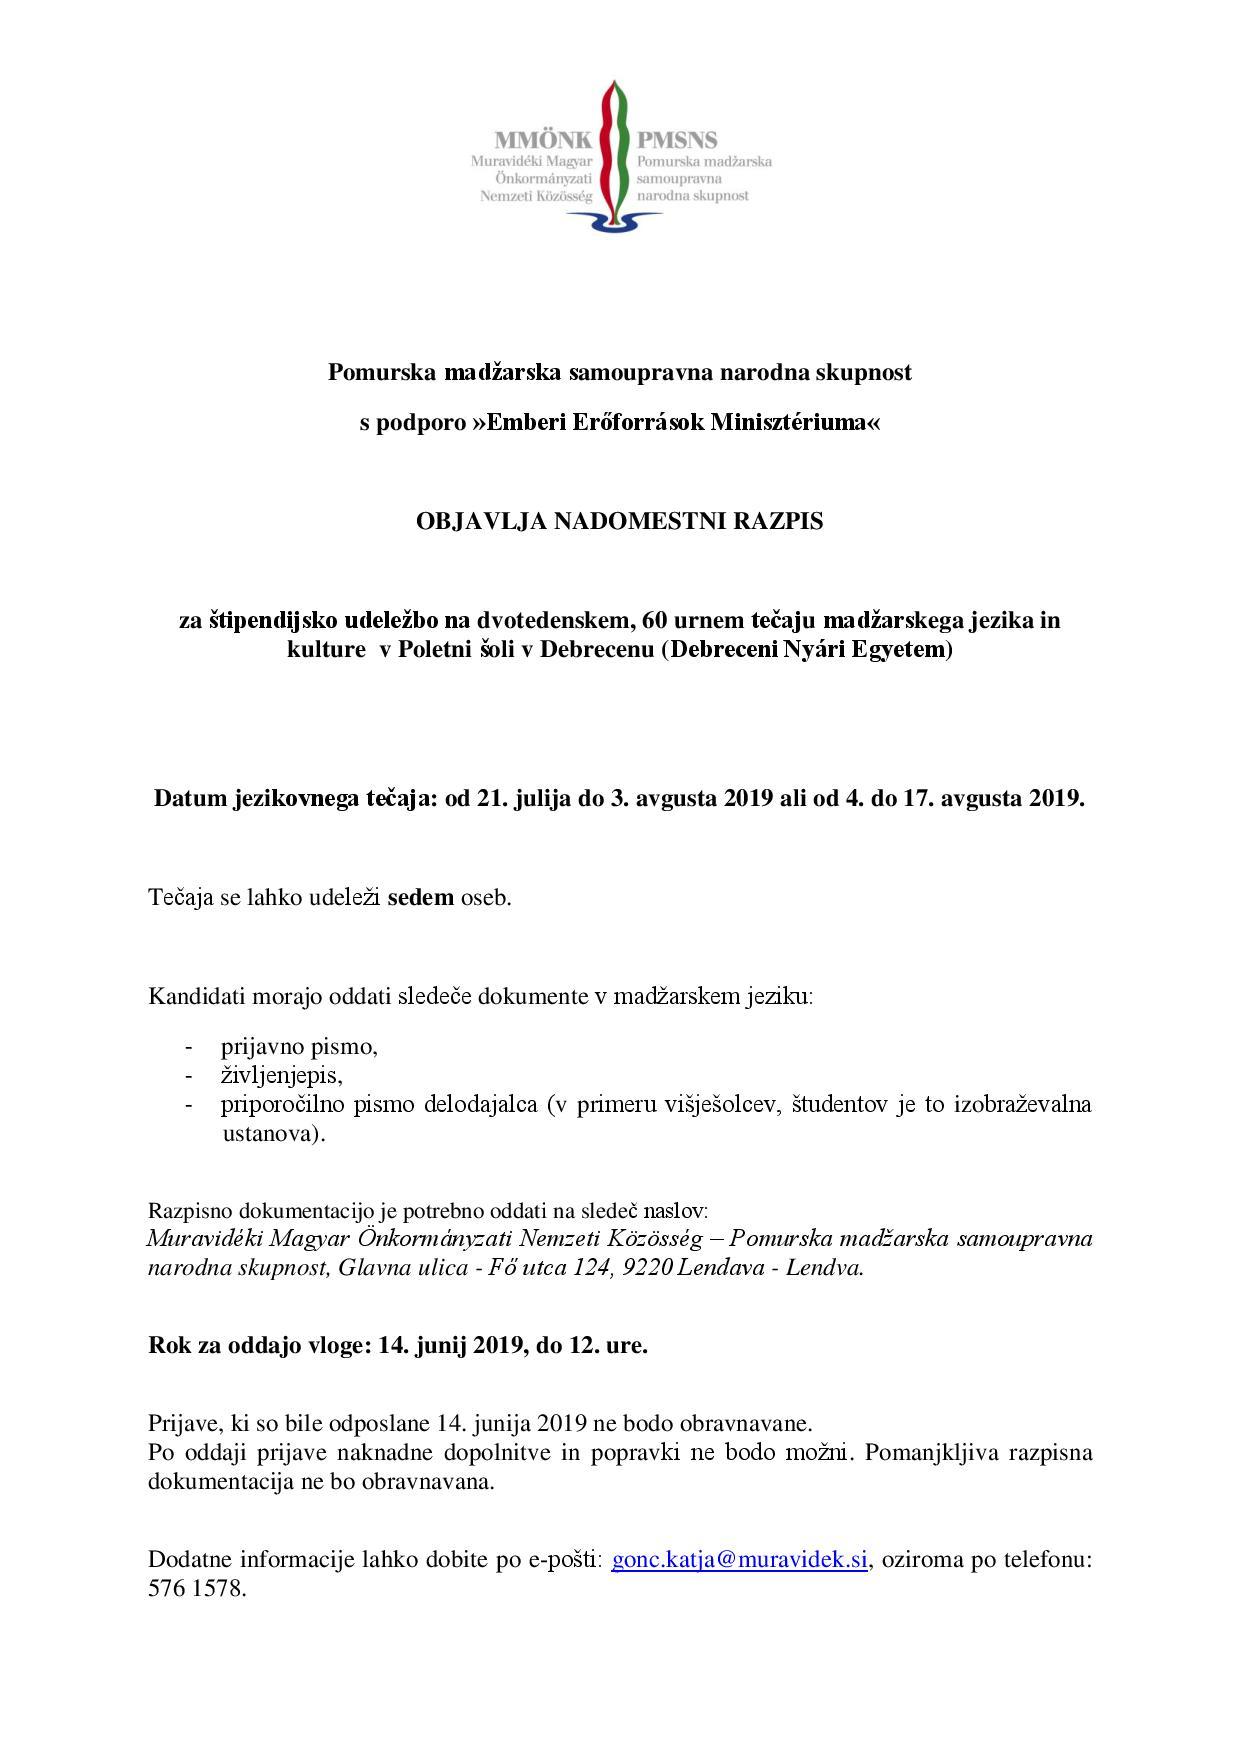 debreceni-nyari-egyetem_2019_potpalyazat_slo-page-001